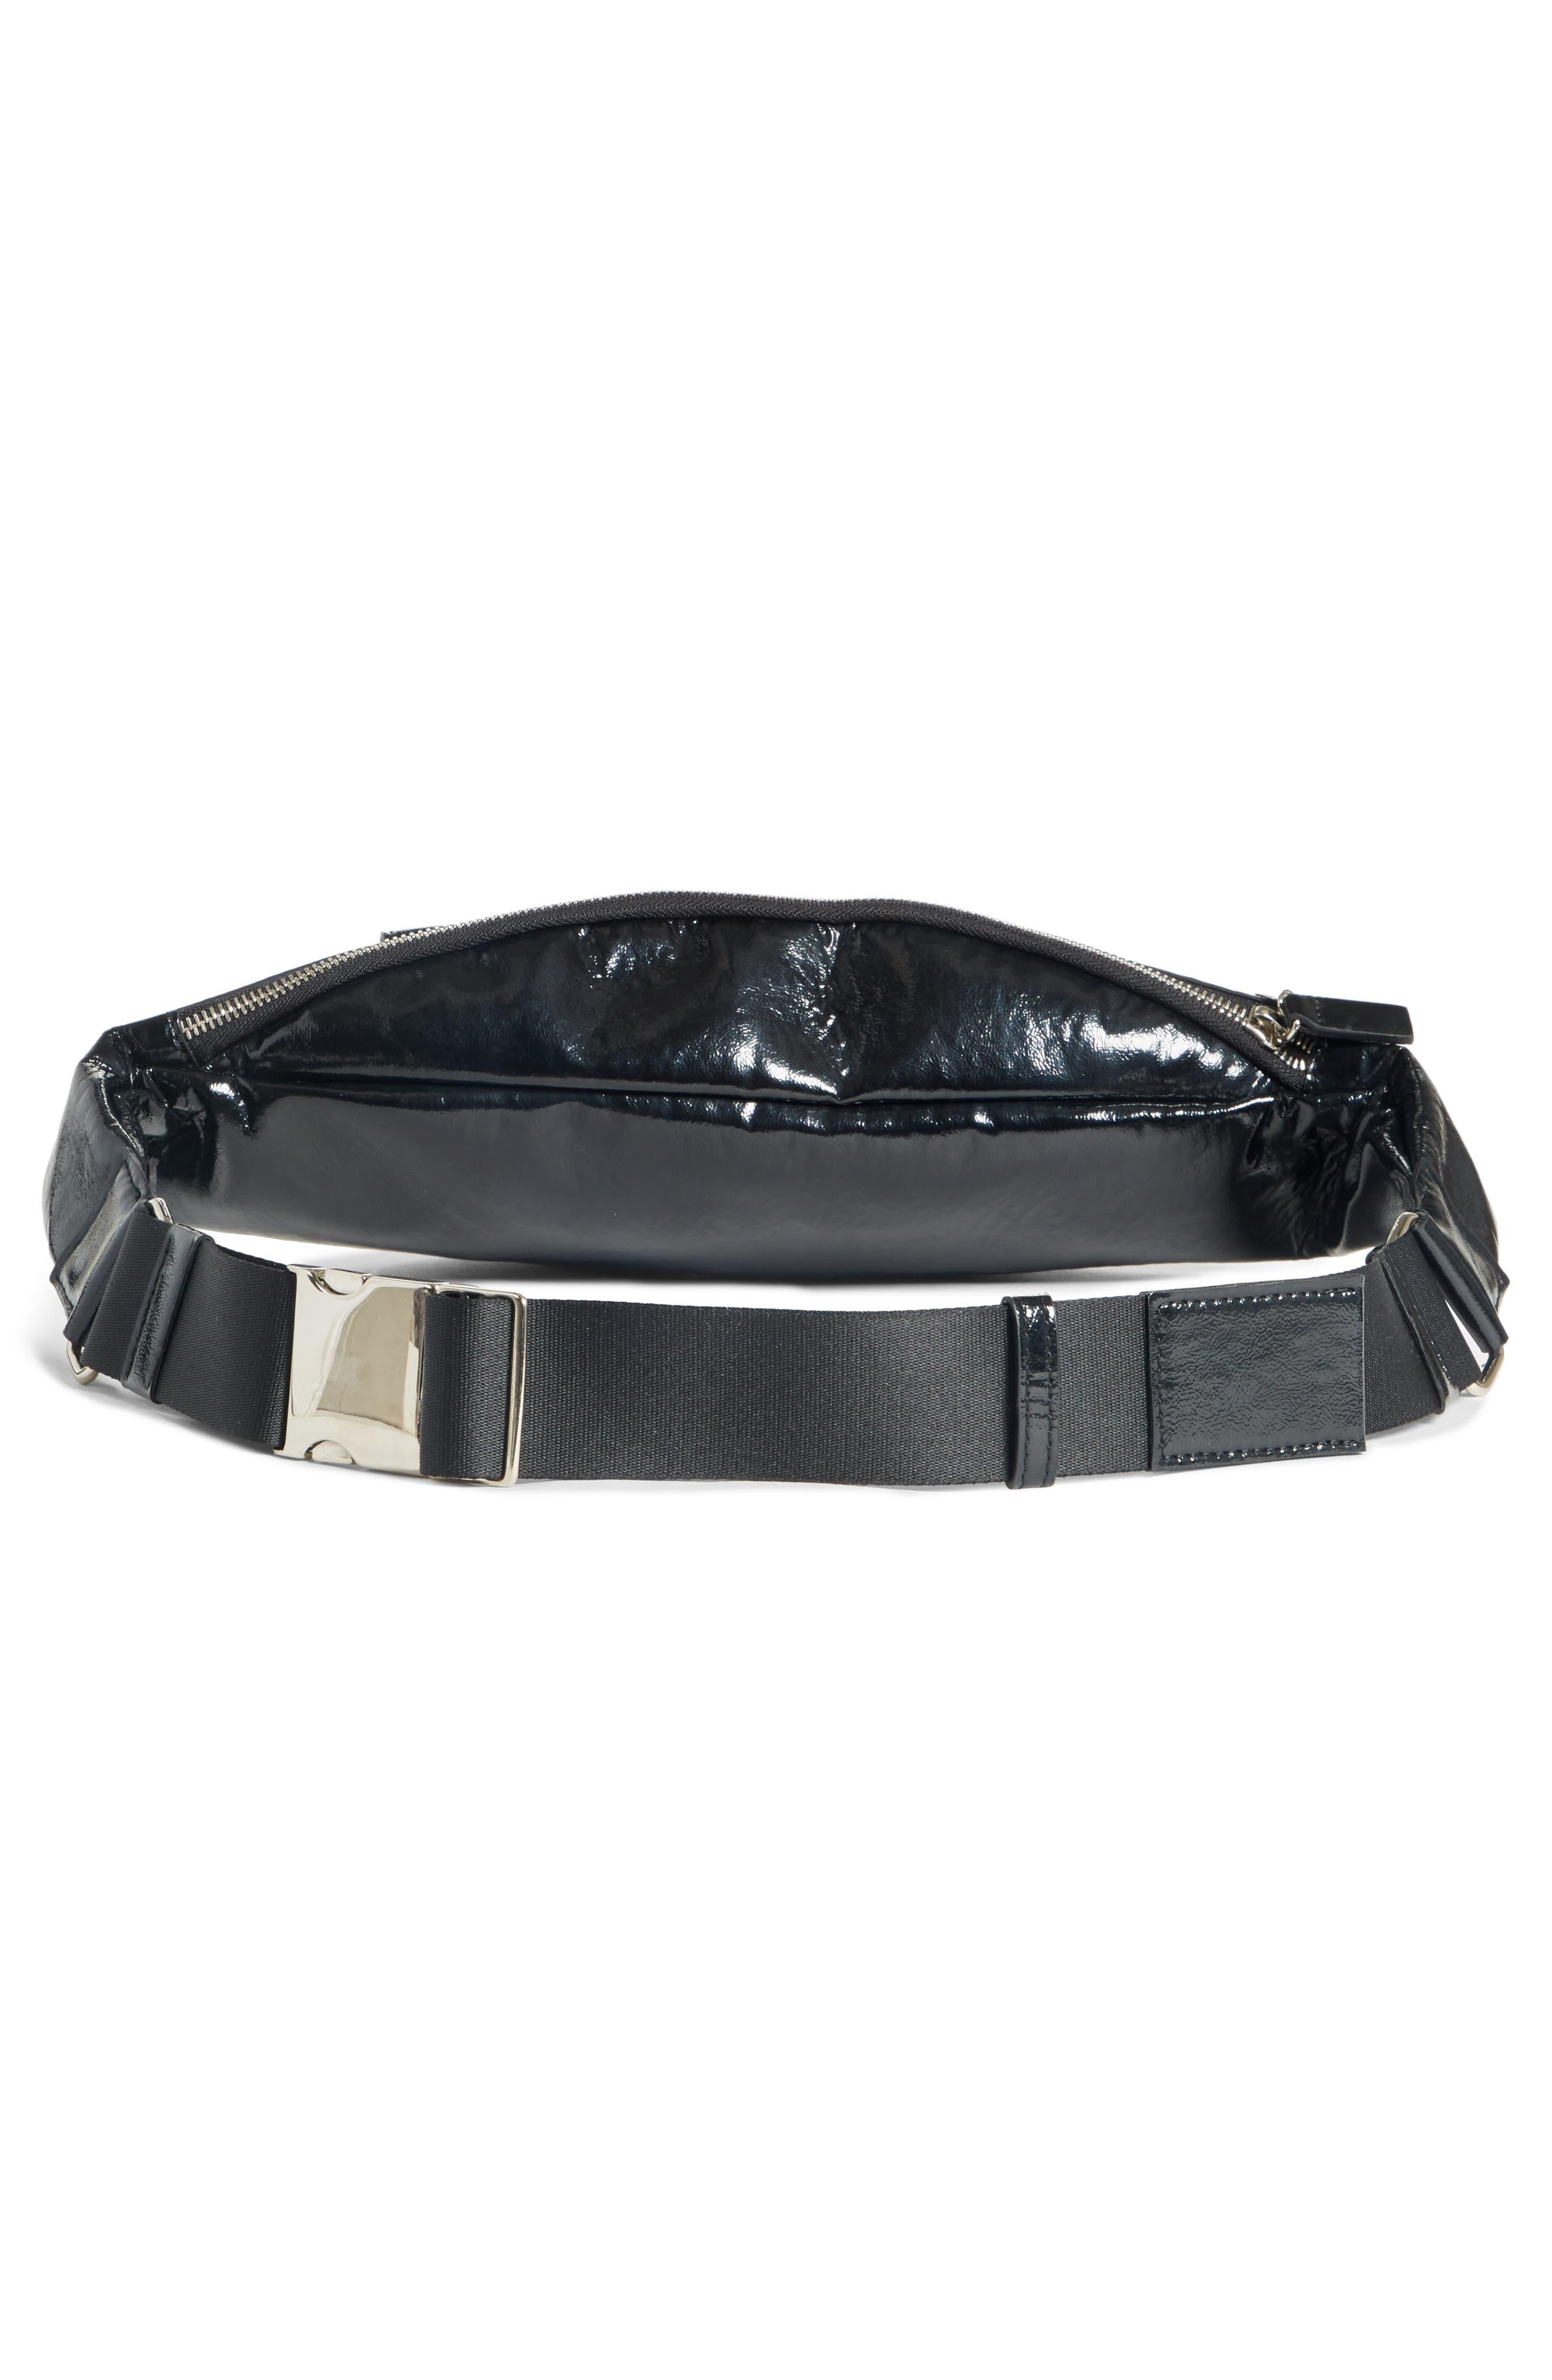 Major Convertible Belt Bag,                             Alternate thumbnail 3, color,                             BLACK PATENT